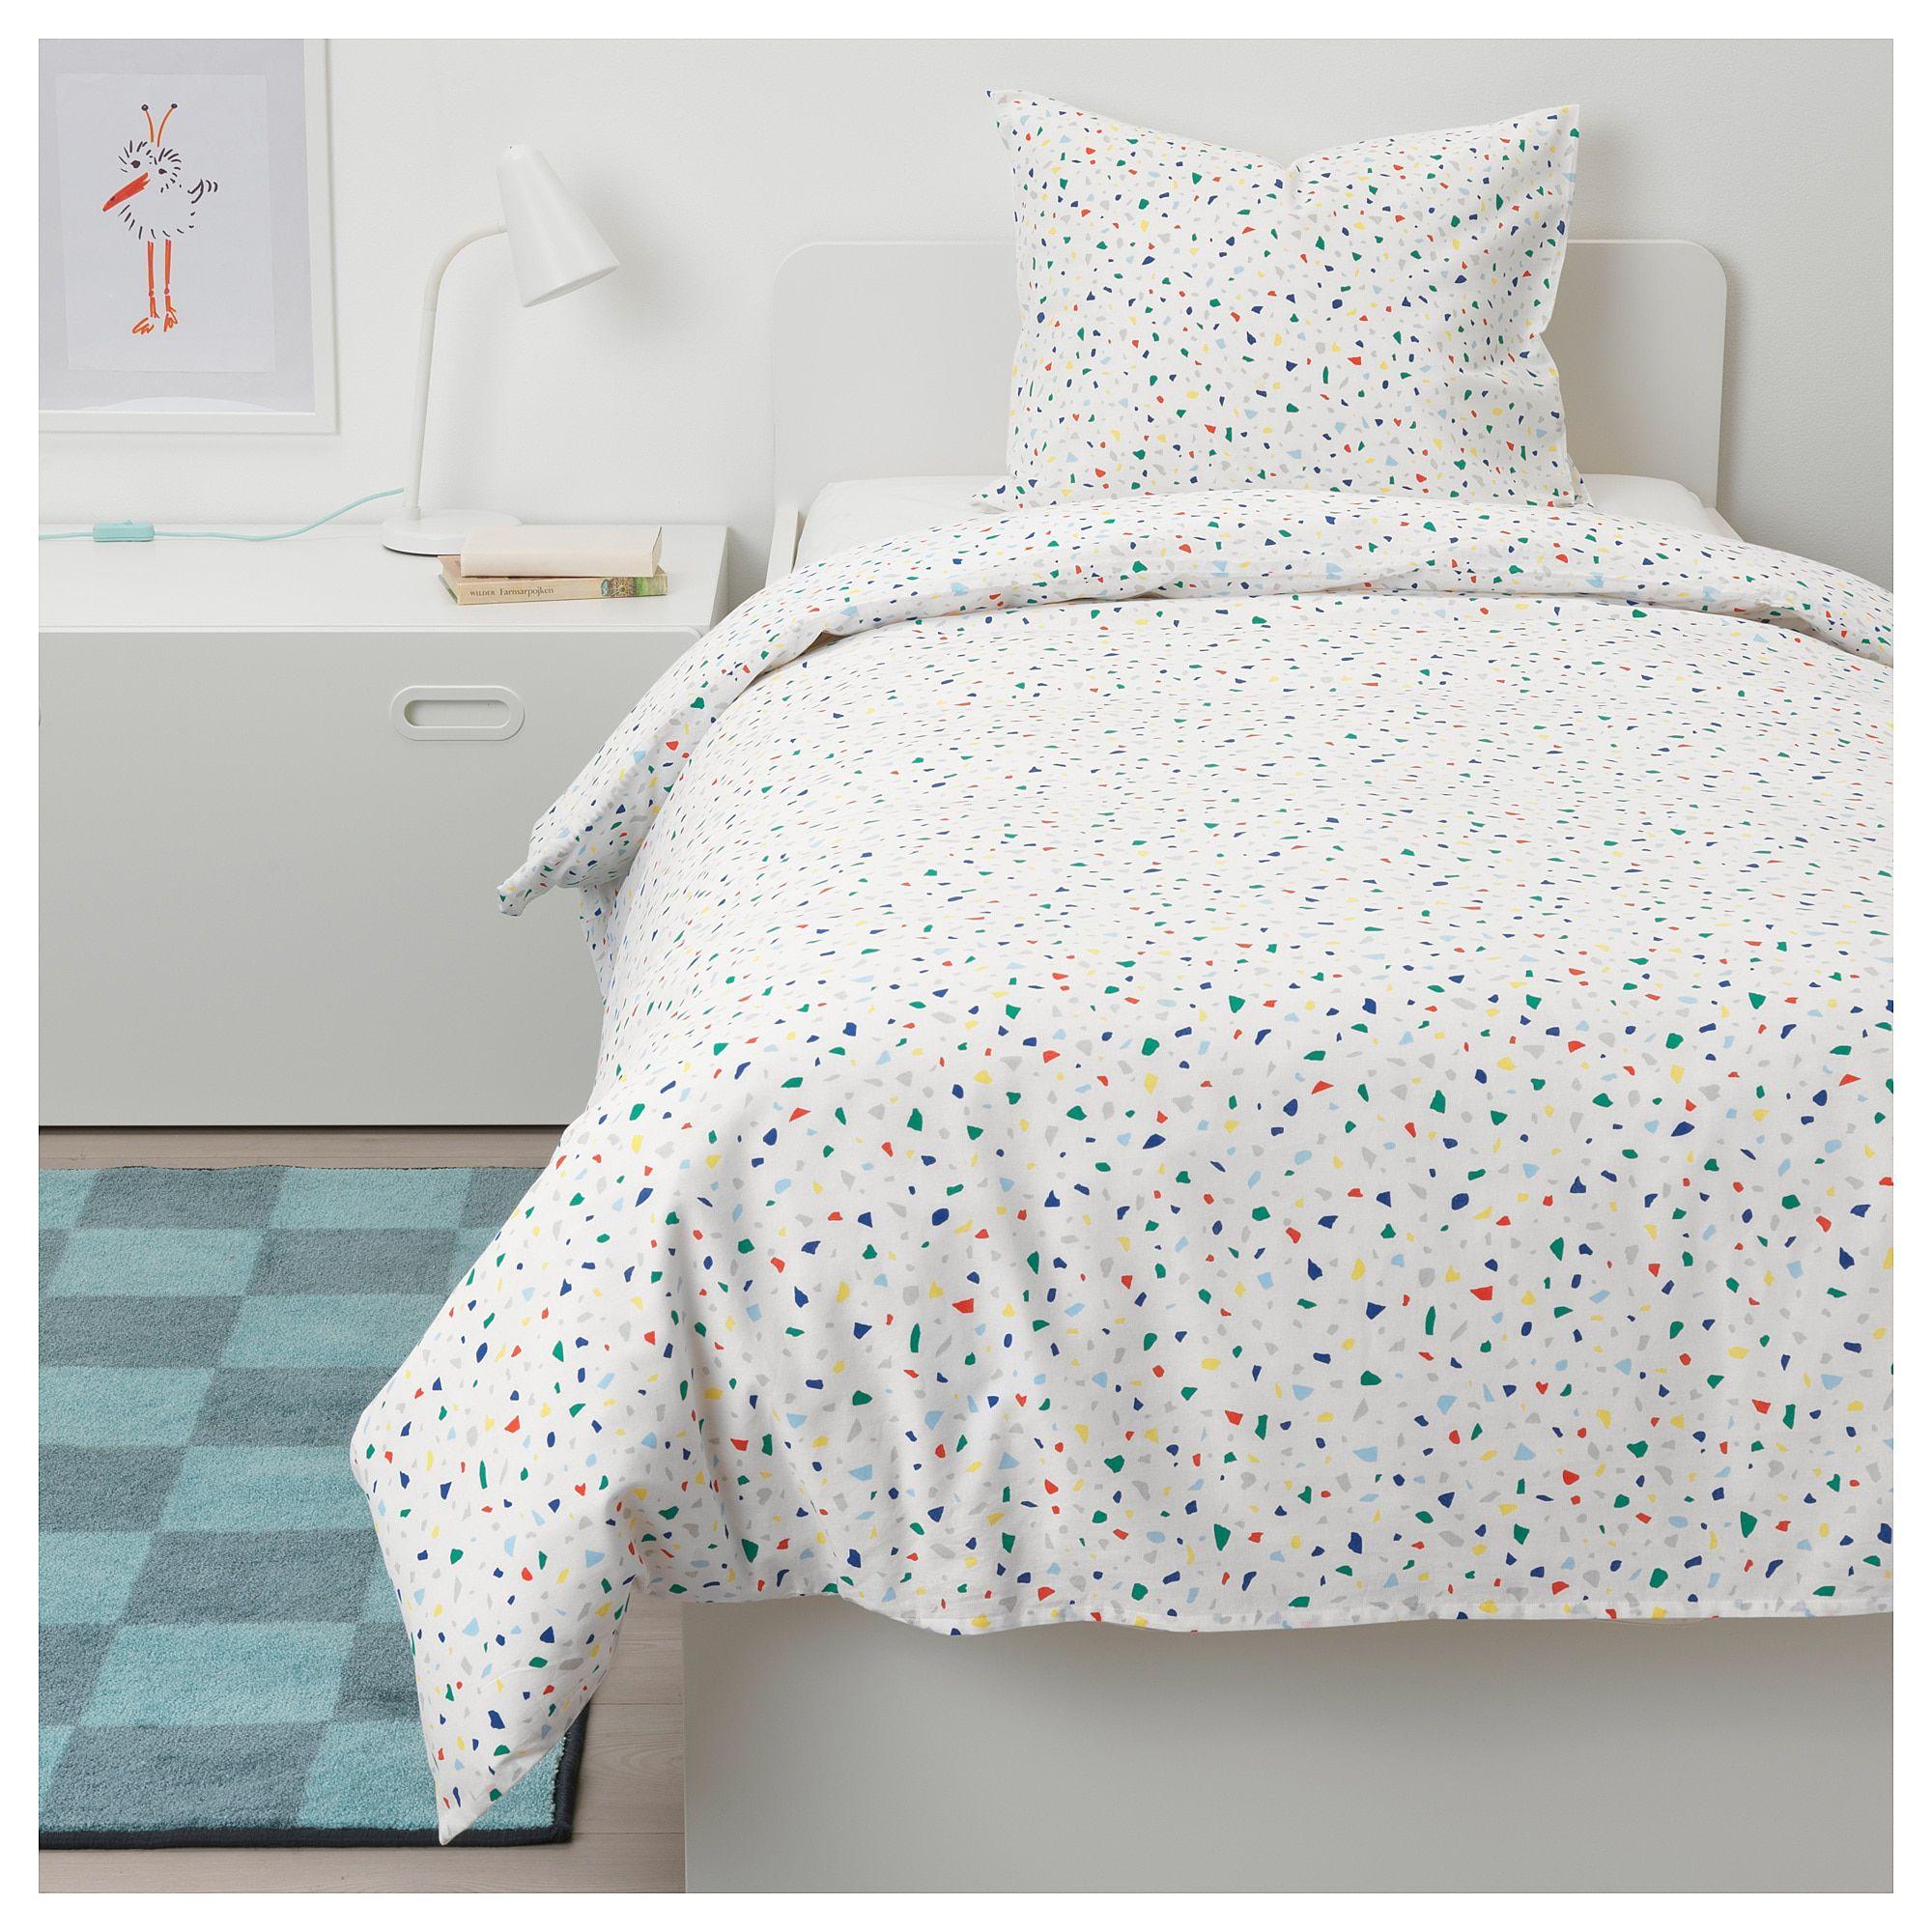 Ikea Mojlighet White Mosaic Patterned Duvet Cover And Pillowcase